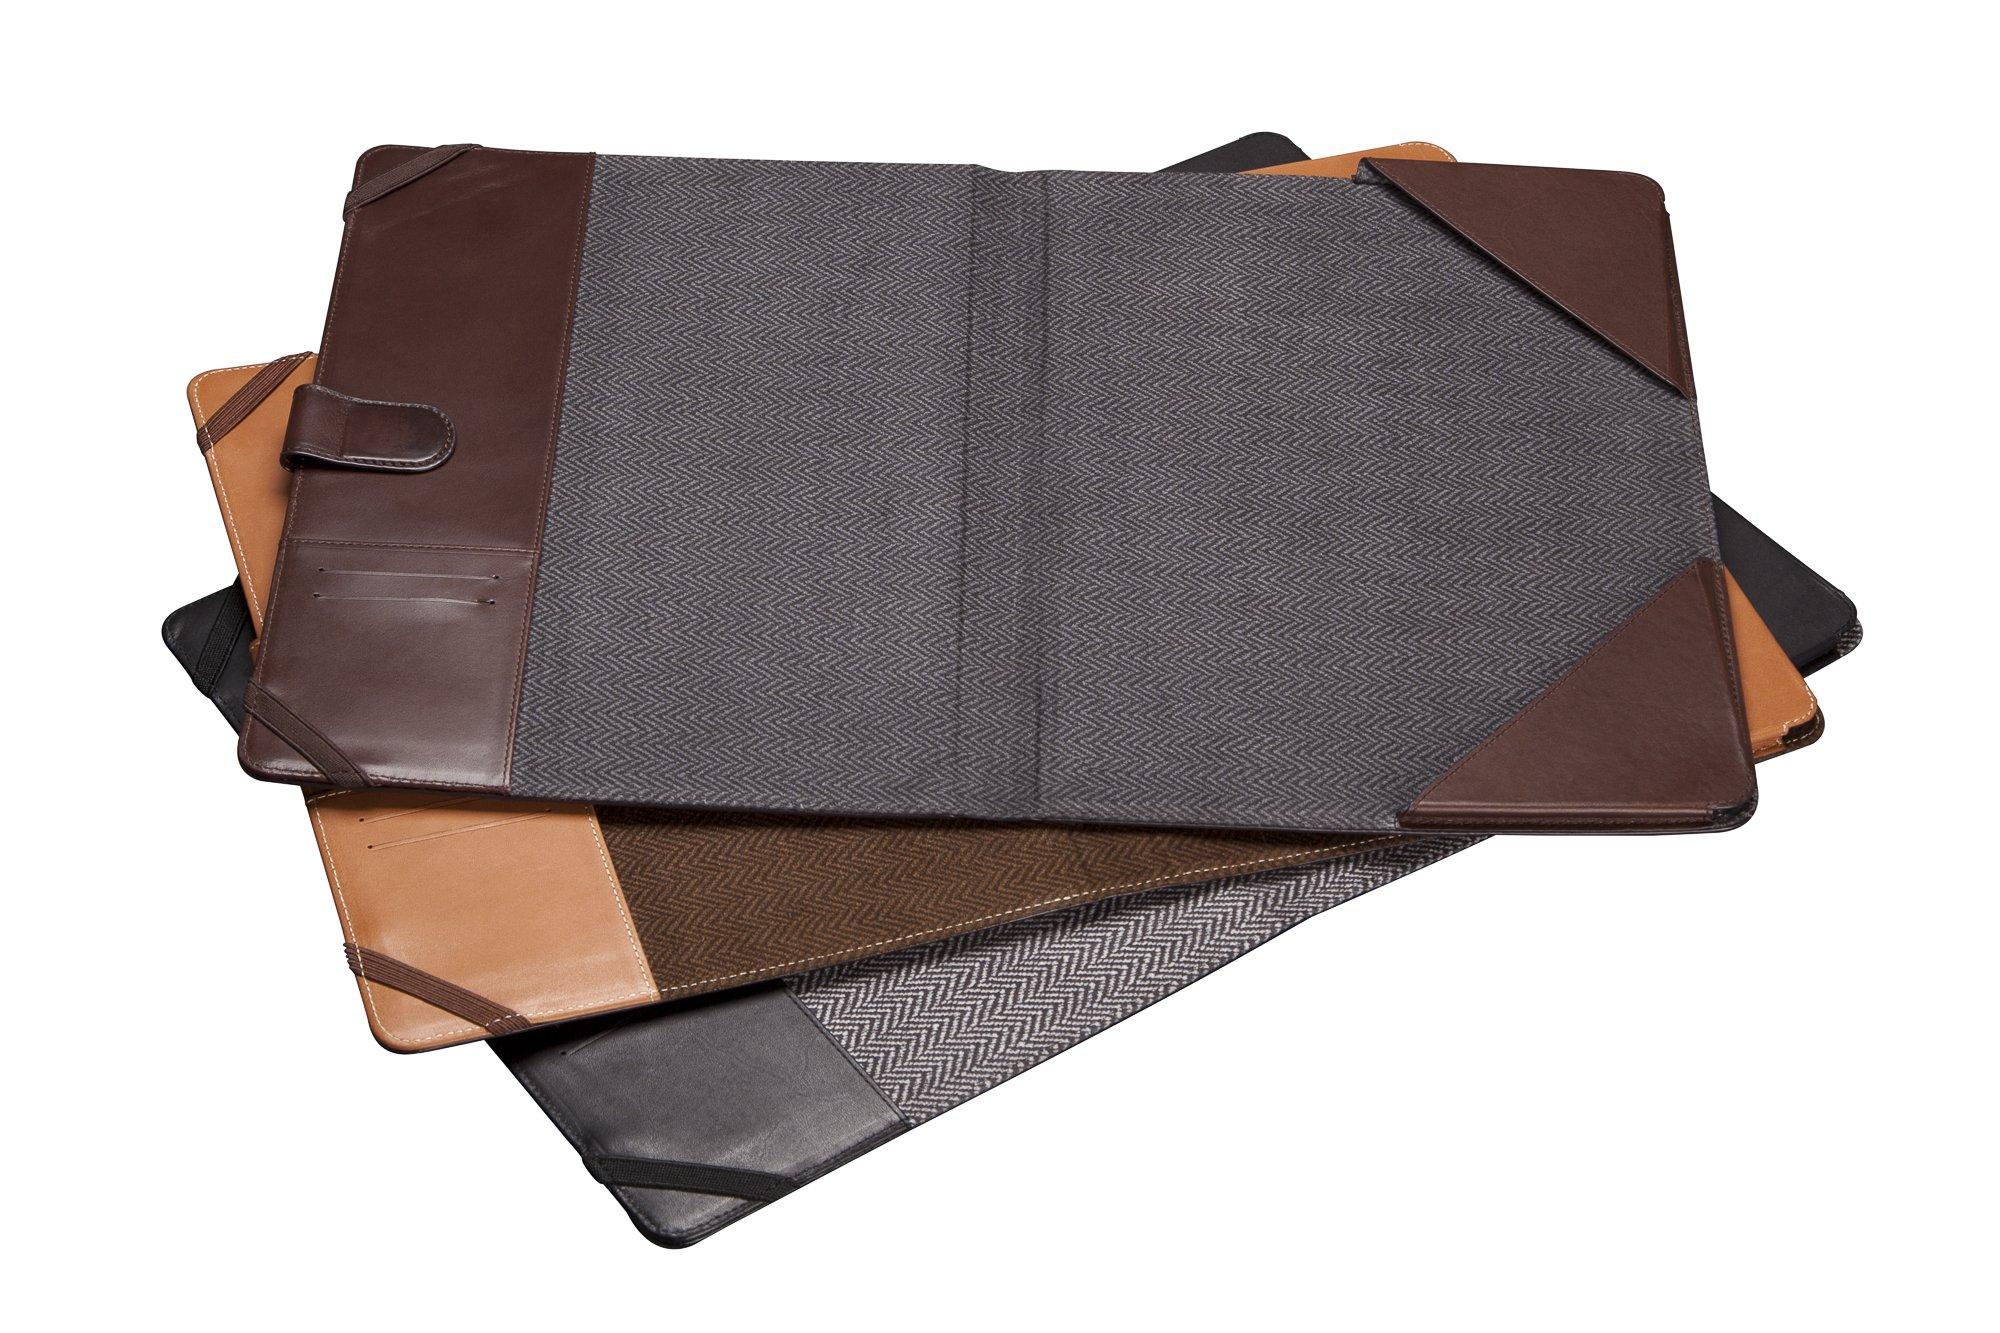 Sena Burnished Portfolio Case for 13-Inch MacBook Air (Tan) by Sena Cases (Image #6)